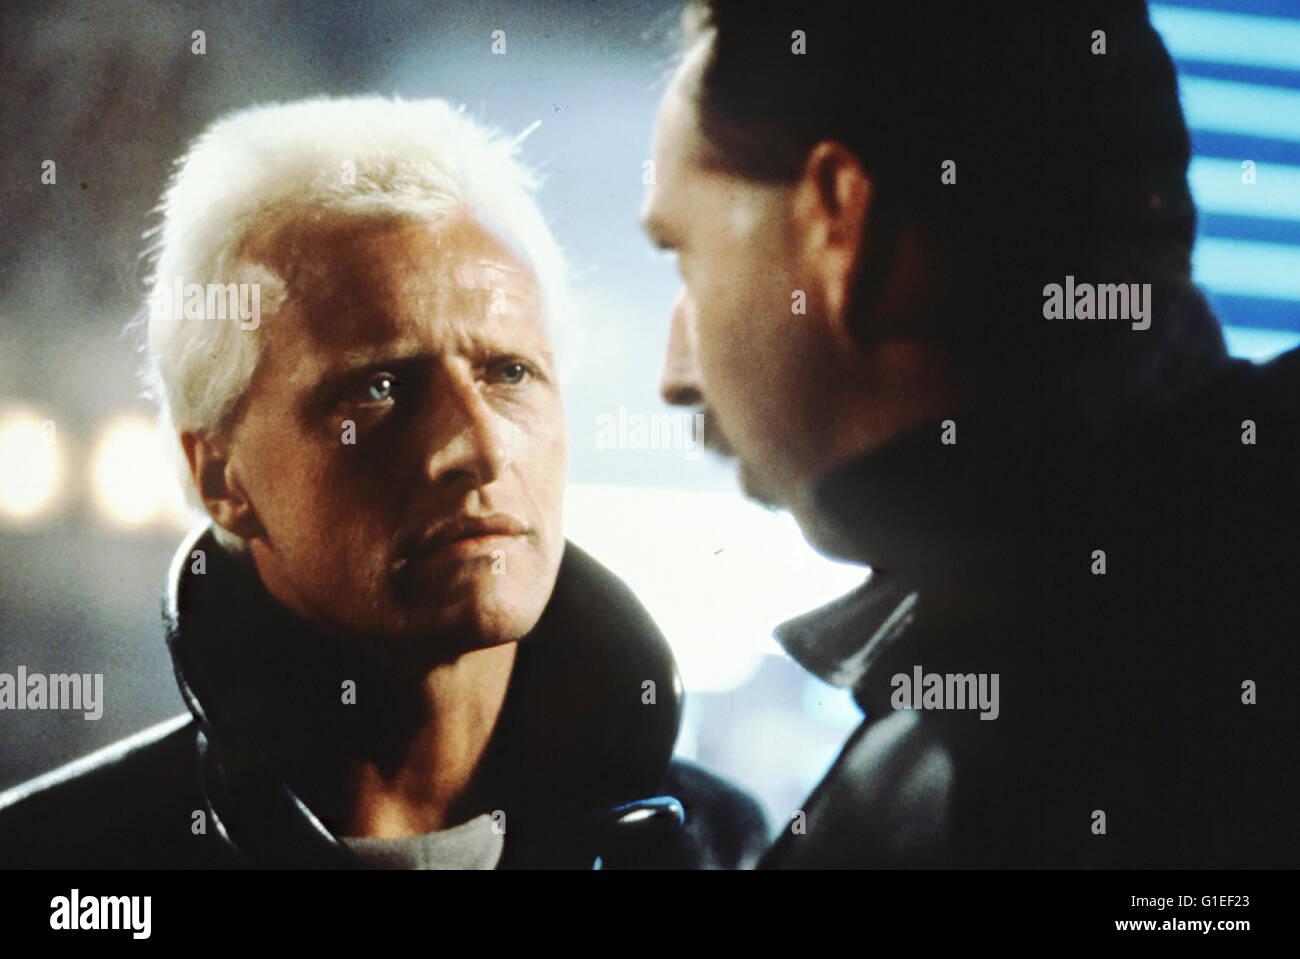 Blade Runner / Rutger Hauer / Blade Runner (Director's Cut) - Stock Image